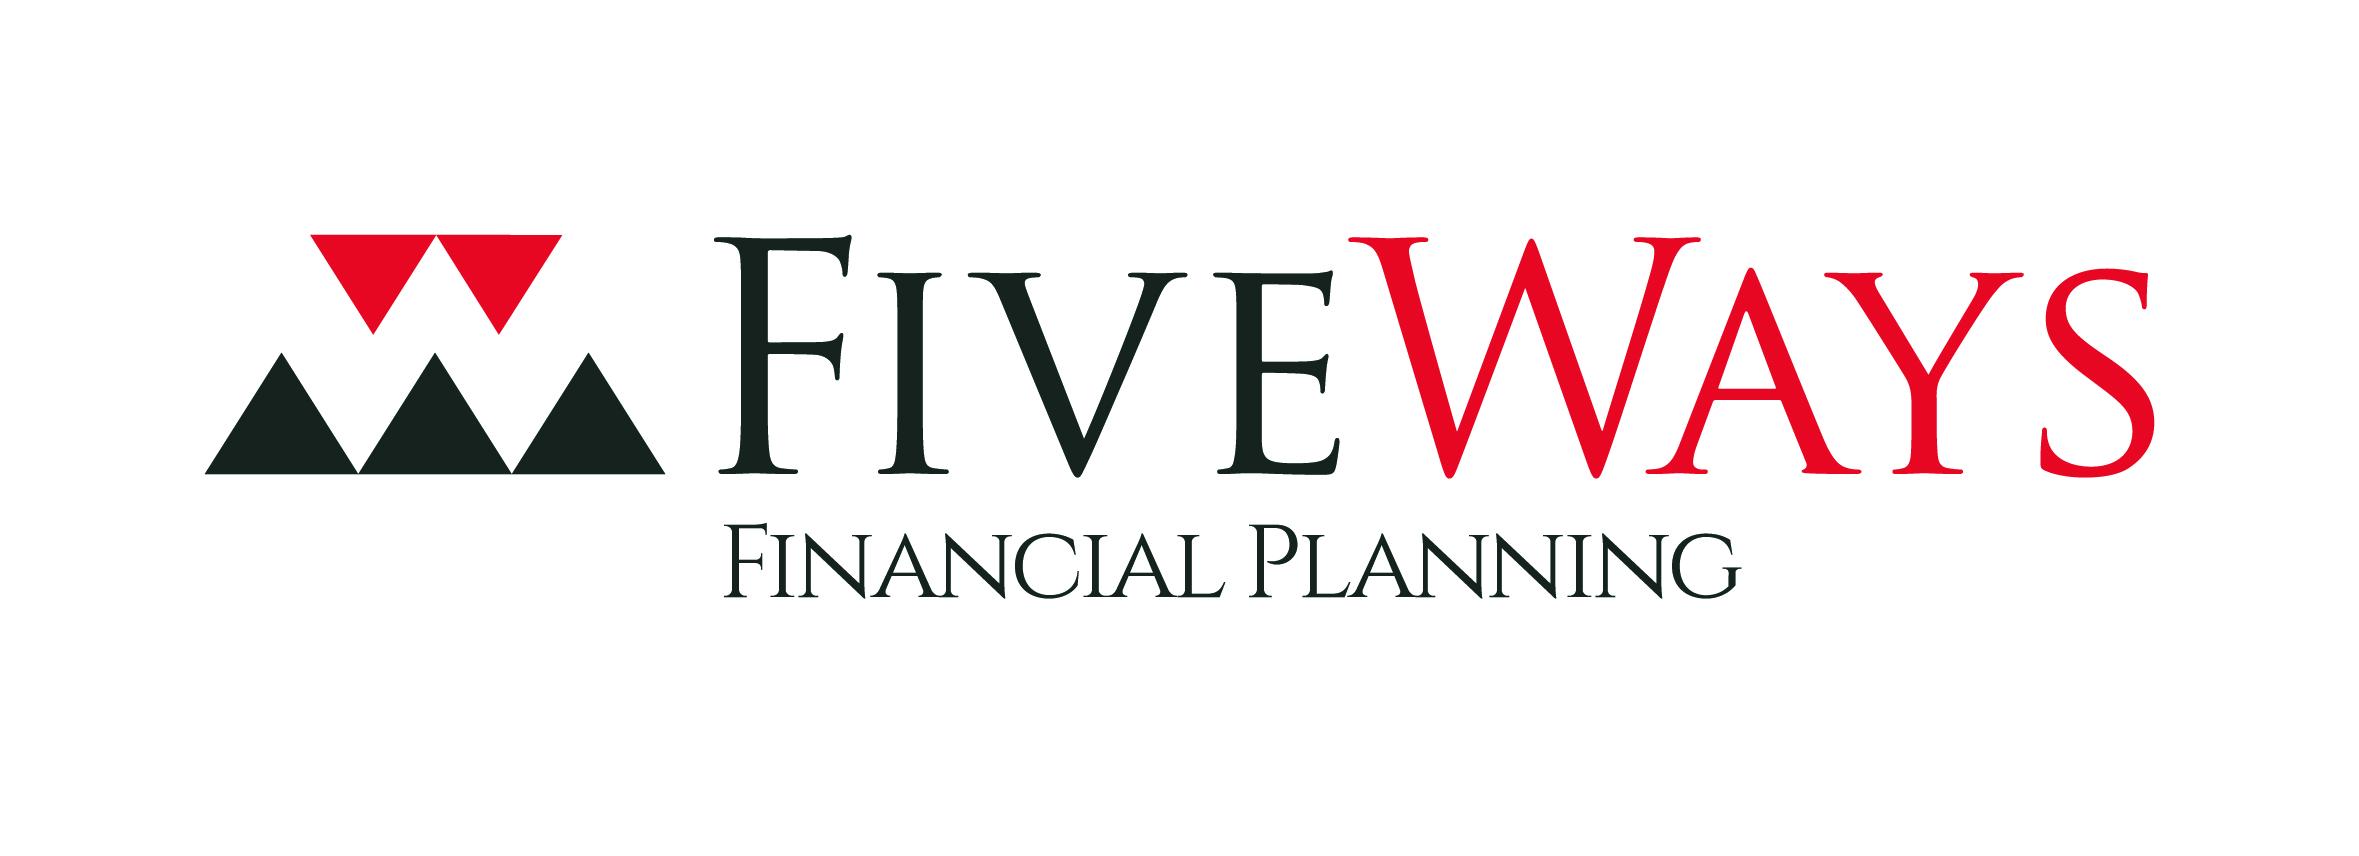 FiveWays Logo Feb 2018-white-CMYK.jpg